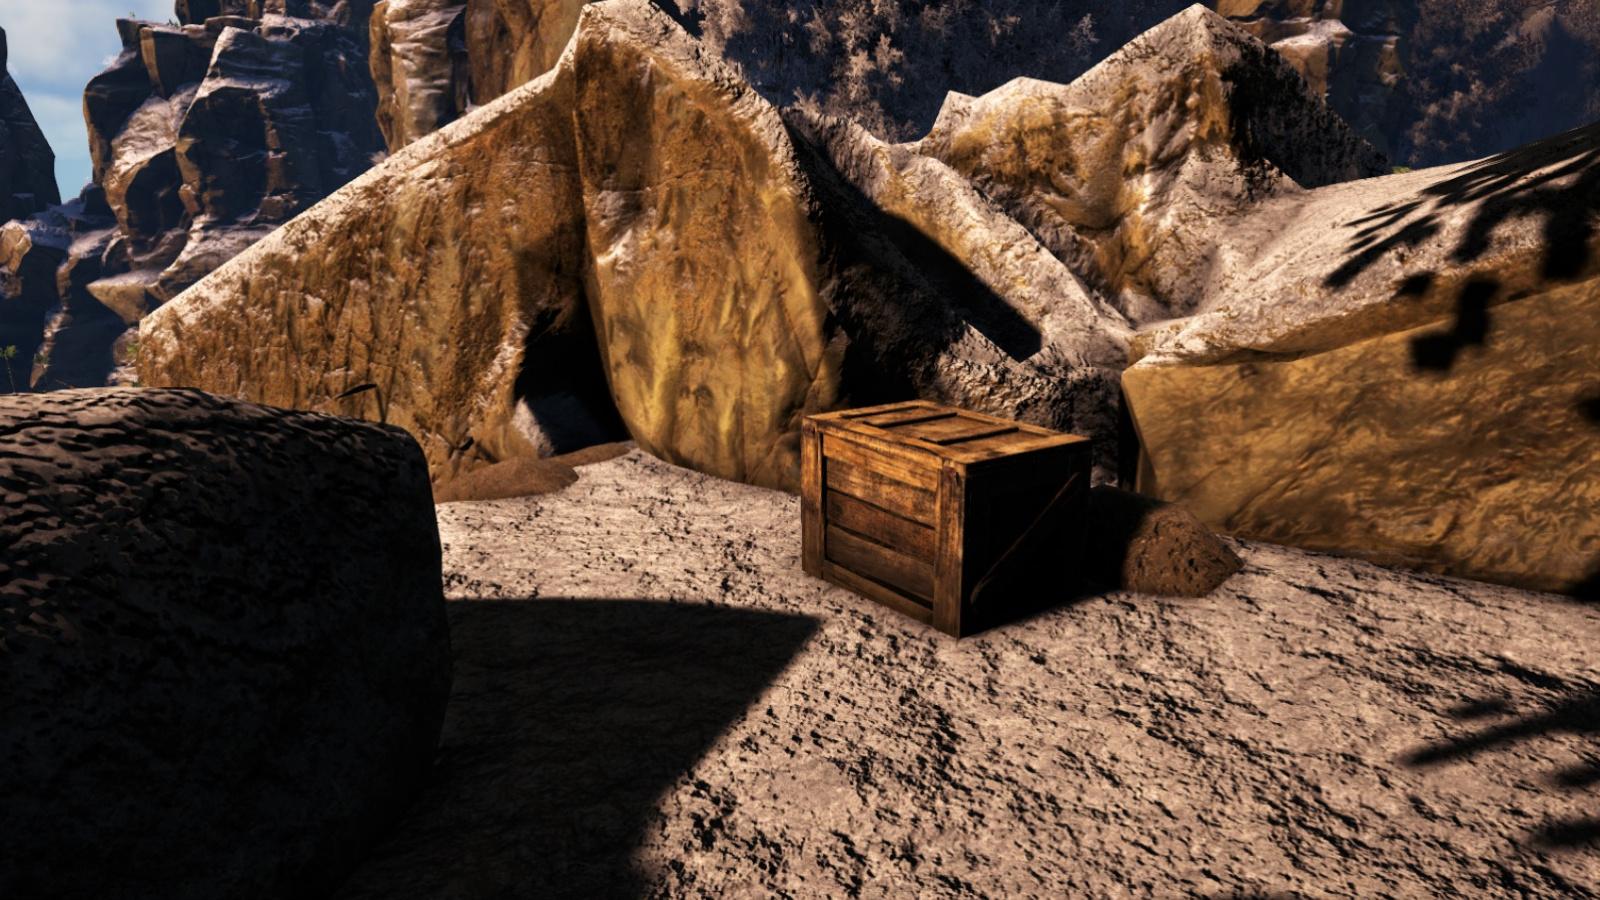 ark survival evolved tek raus weihnachten rein game2gether. Black Bedroom Furniture Sets. Home Design Ideas